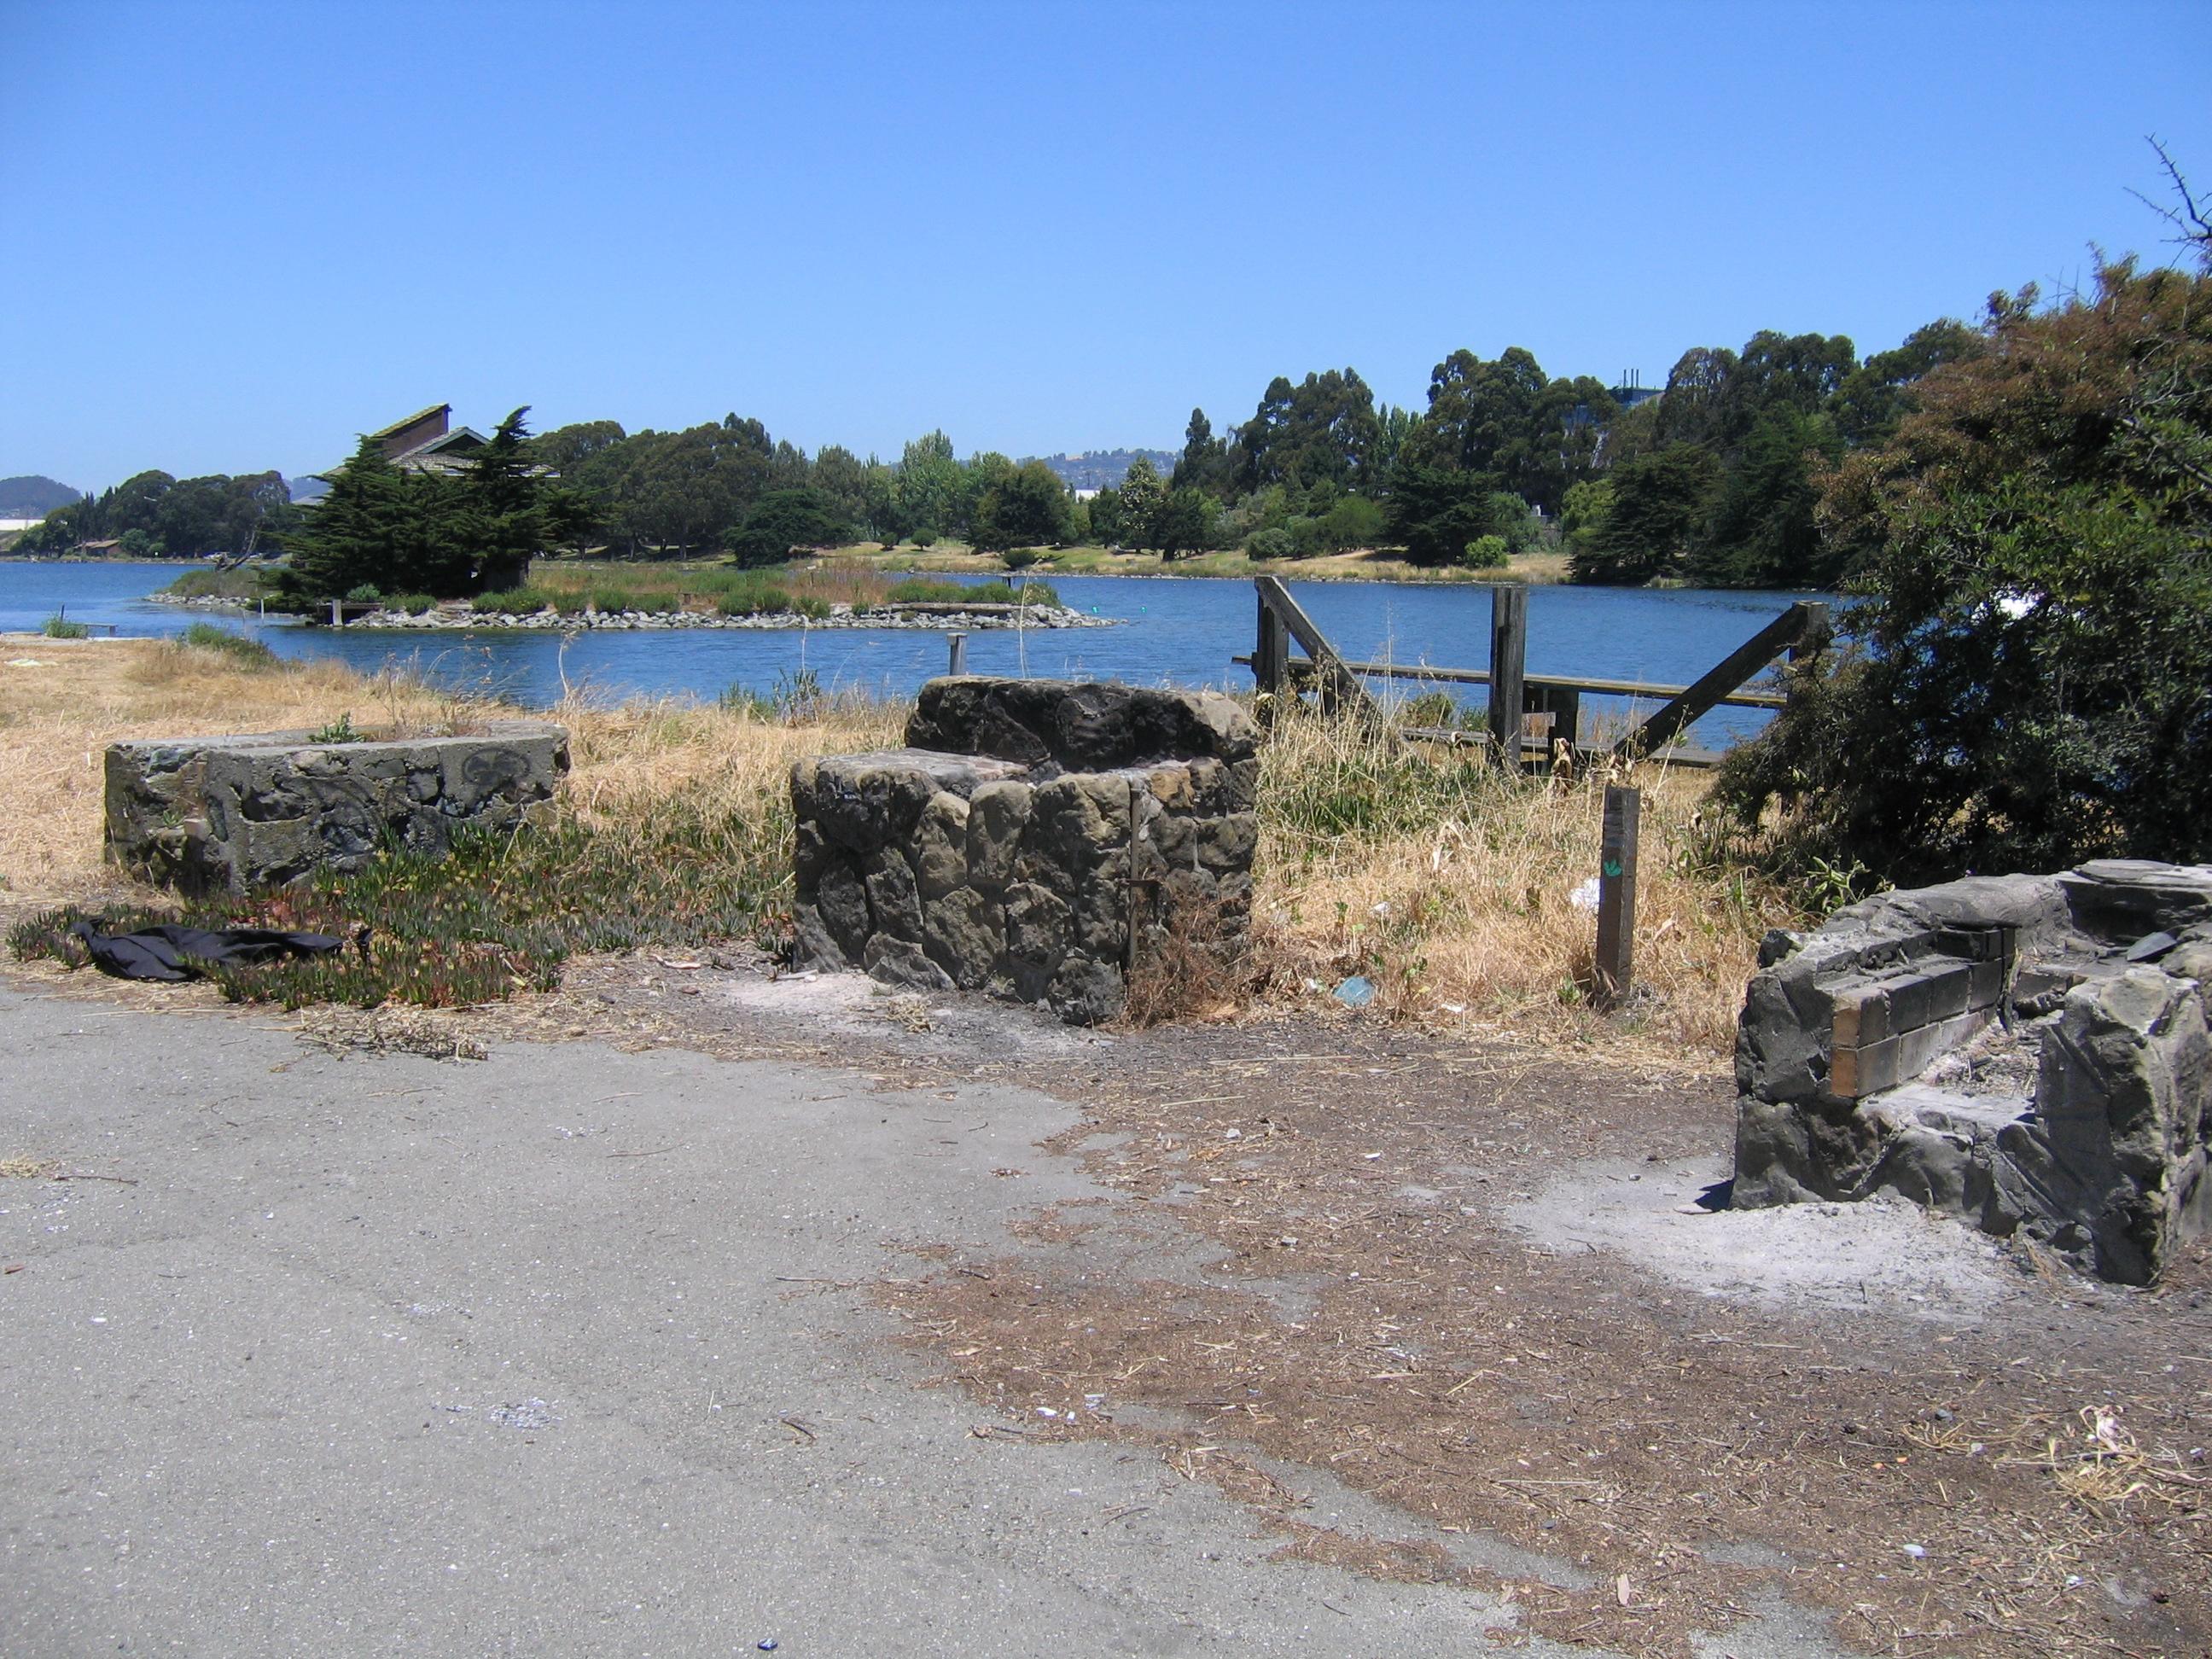 Crumbling WPA rockwork at Aquatic Park, Berkeley, California